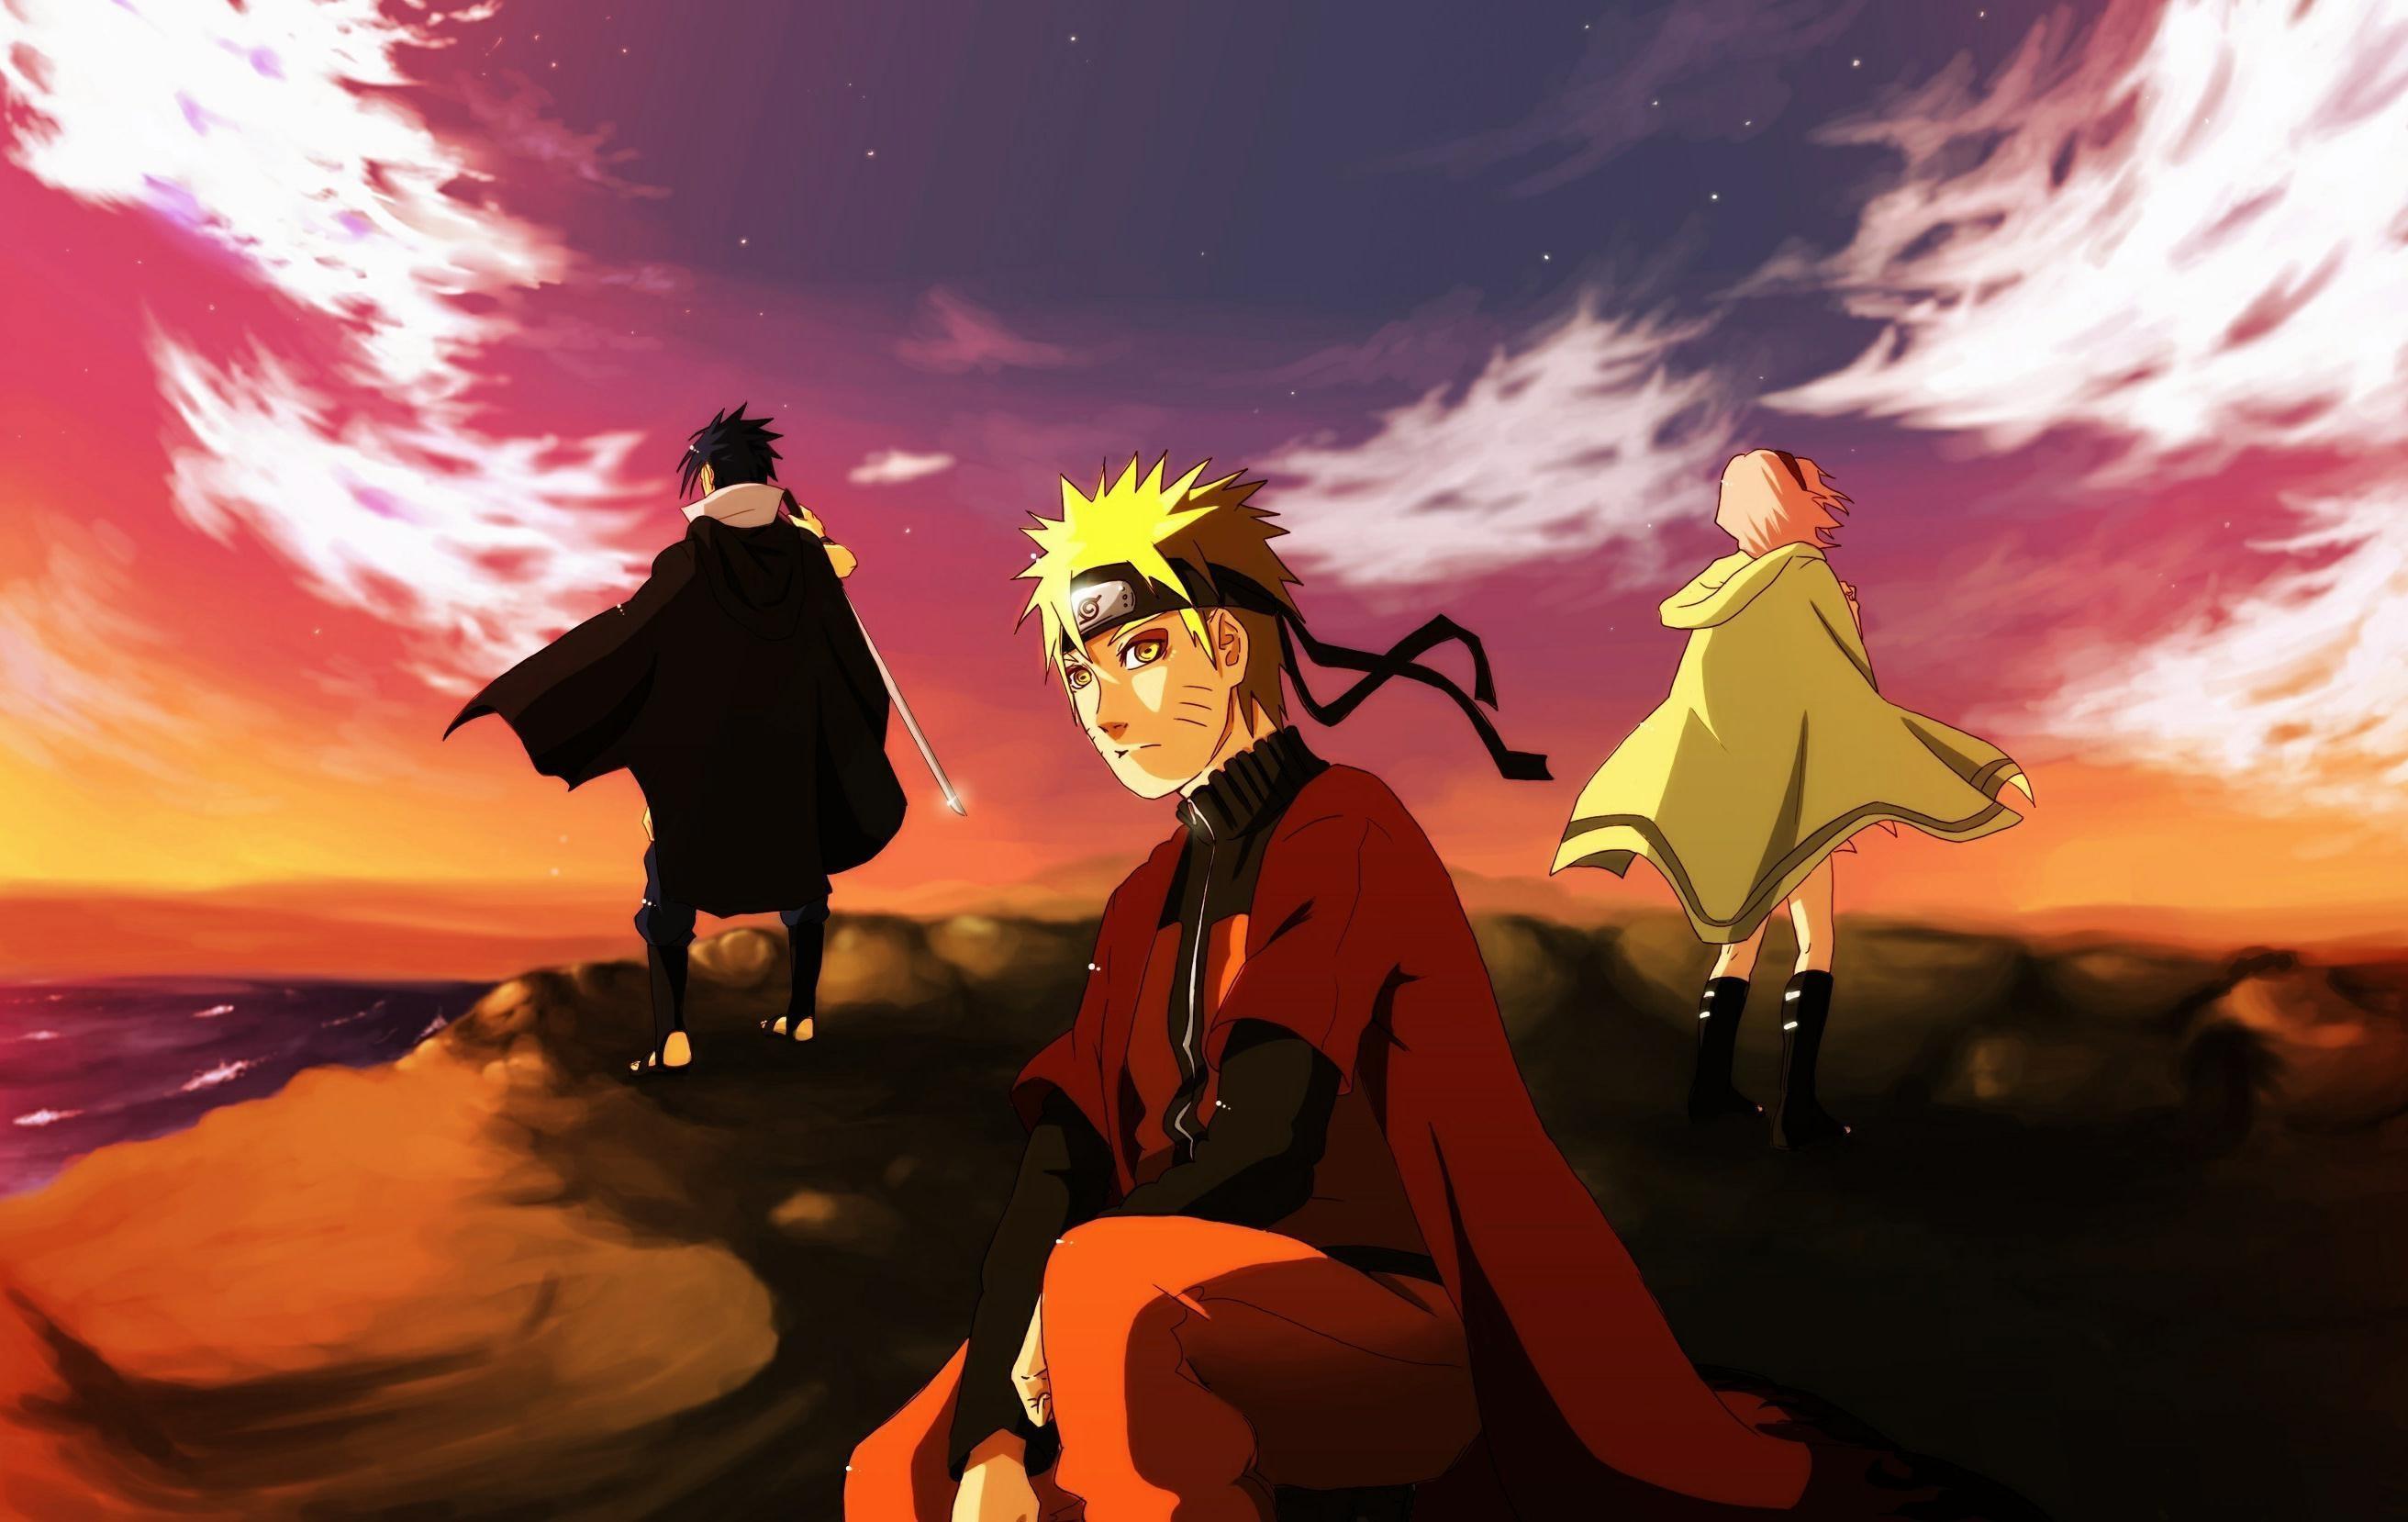 Res: 2624x1658, Naruto, Team von sieben, Sasuke Uchiha, Kunst, Meer, Klippe, Naruto  Uzumaki, Sakura haruno